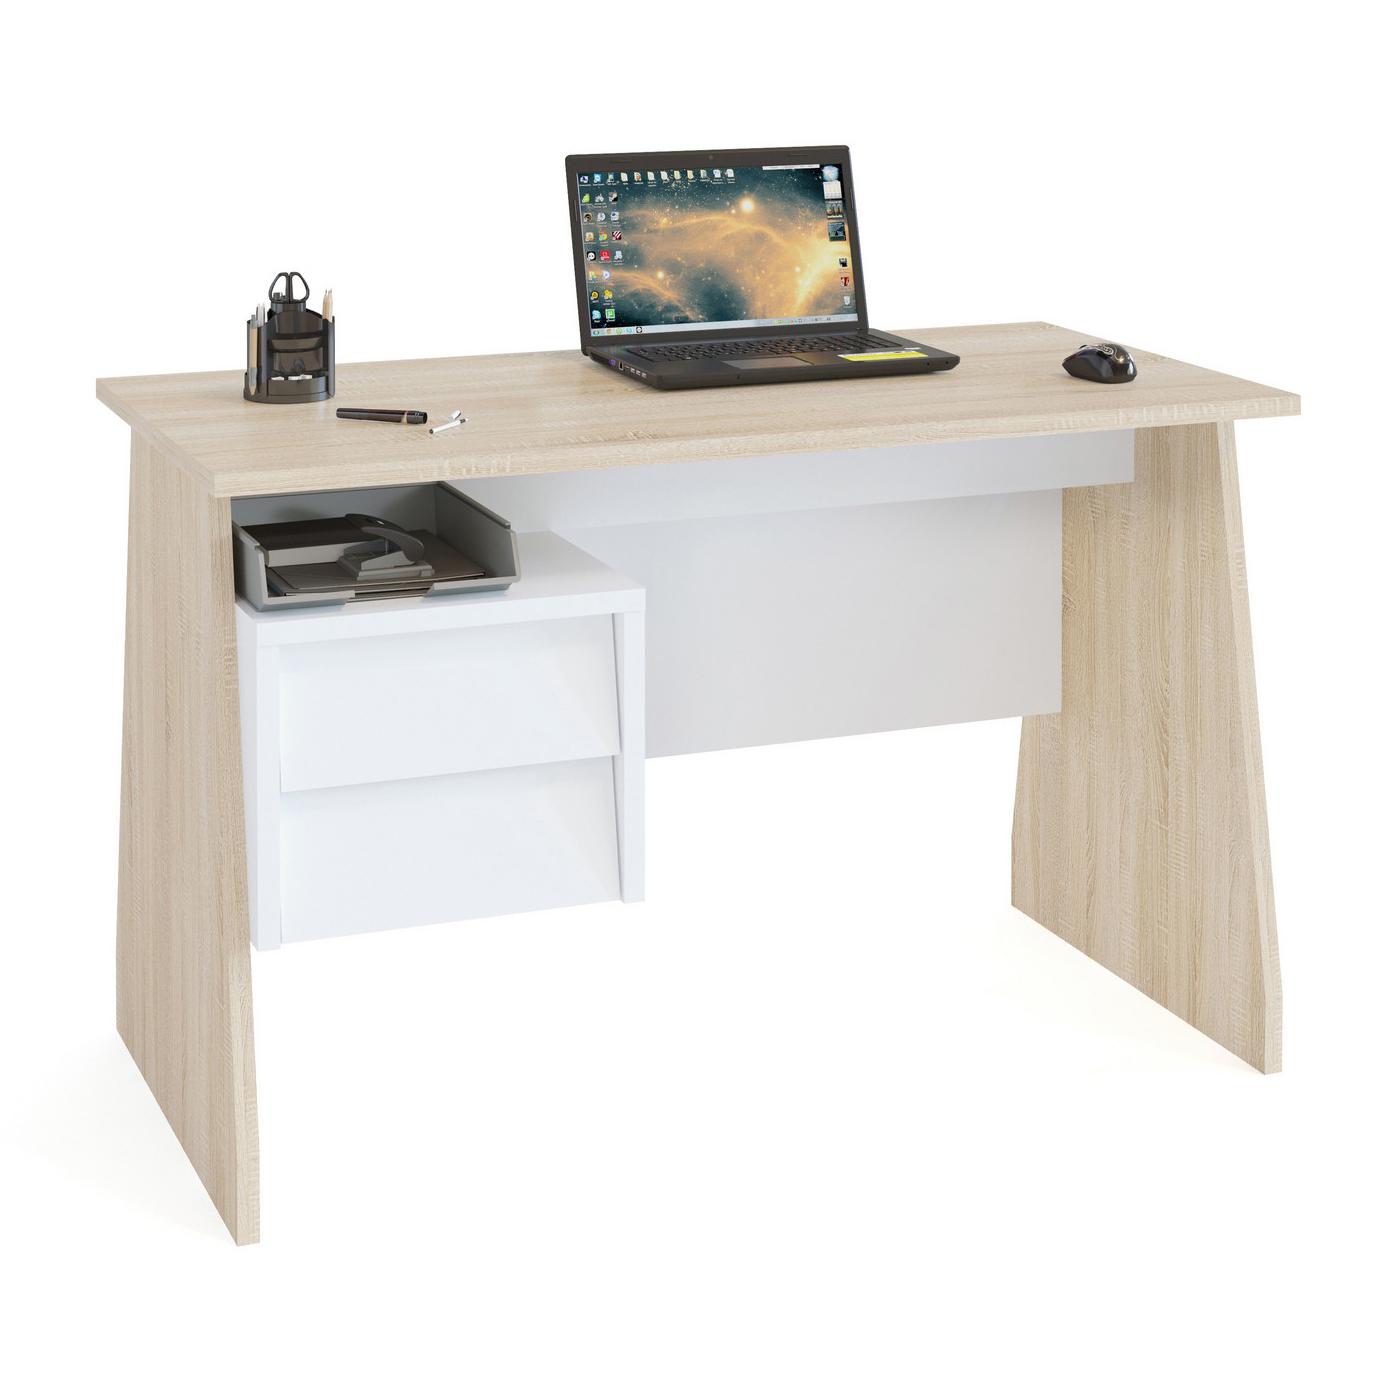 Компьютерный стол СОКОЛ КСТ-115 120x60x75, дуб сонома/белый